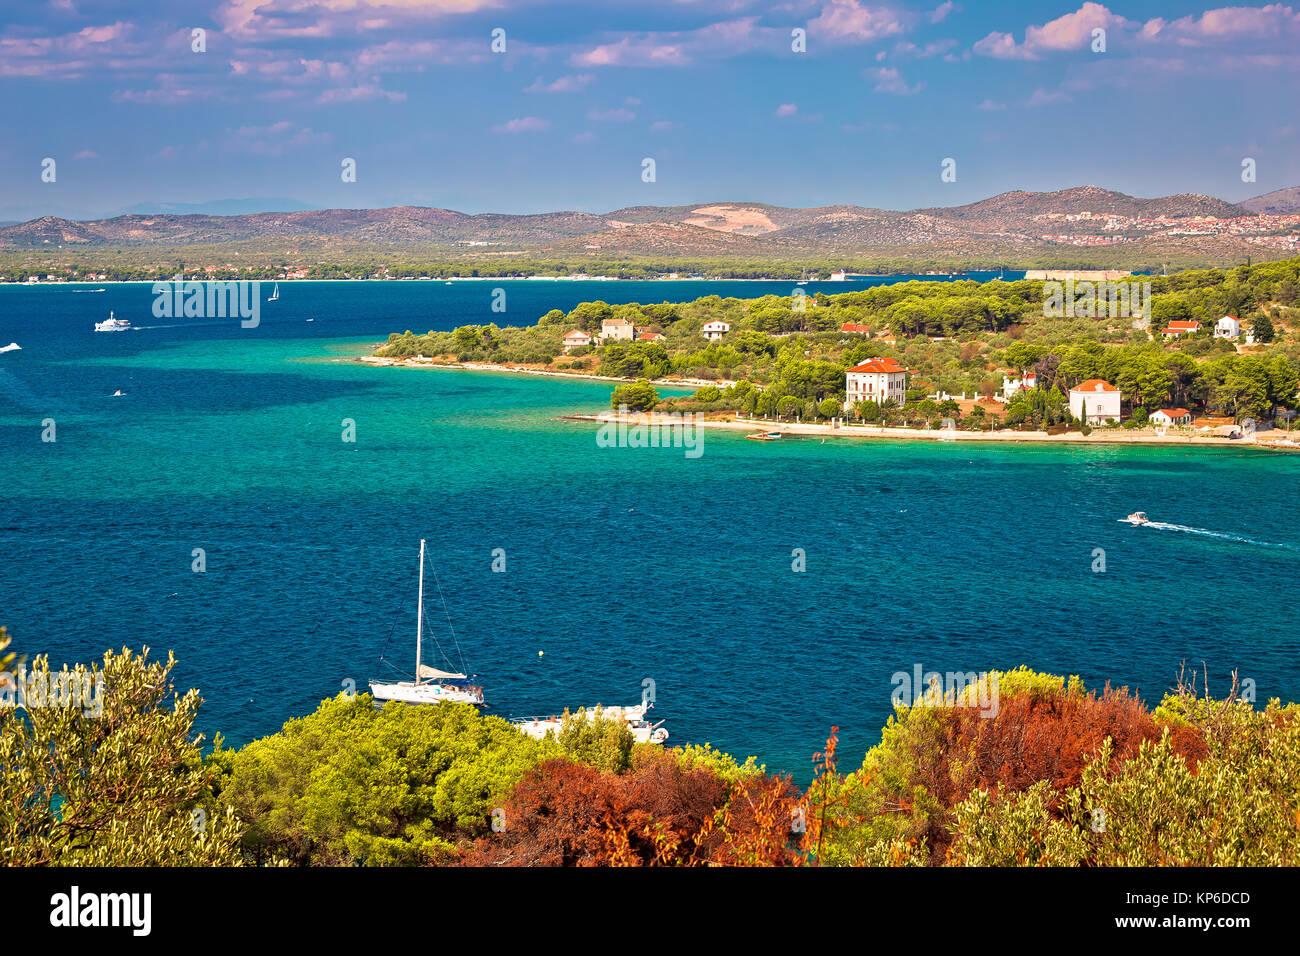 Island of Zlarin and archipelago of Sibenik view, Dalmatia region of Croatia - Stock Image